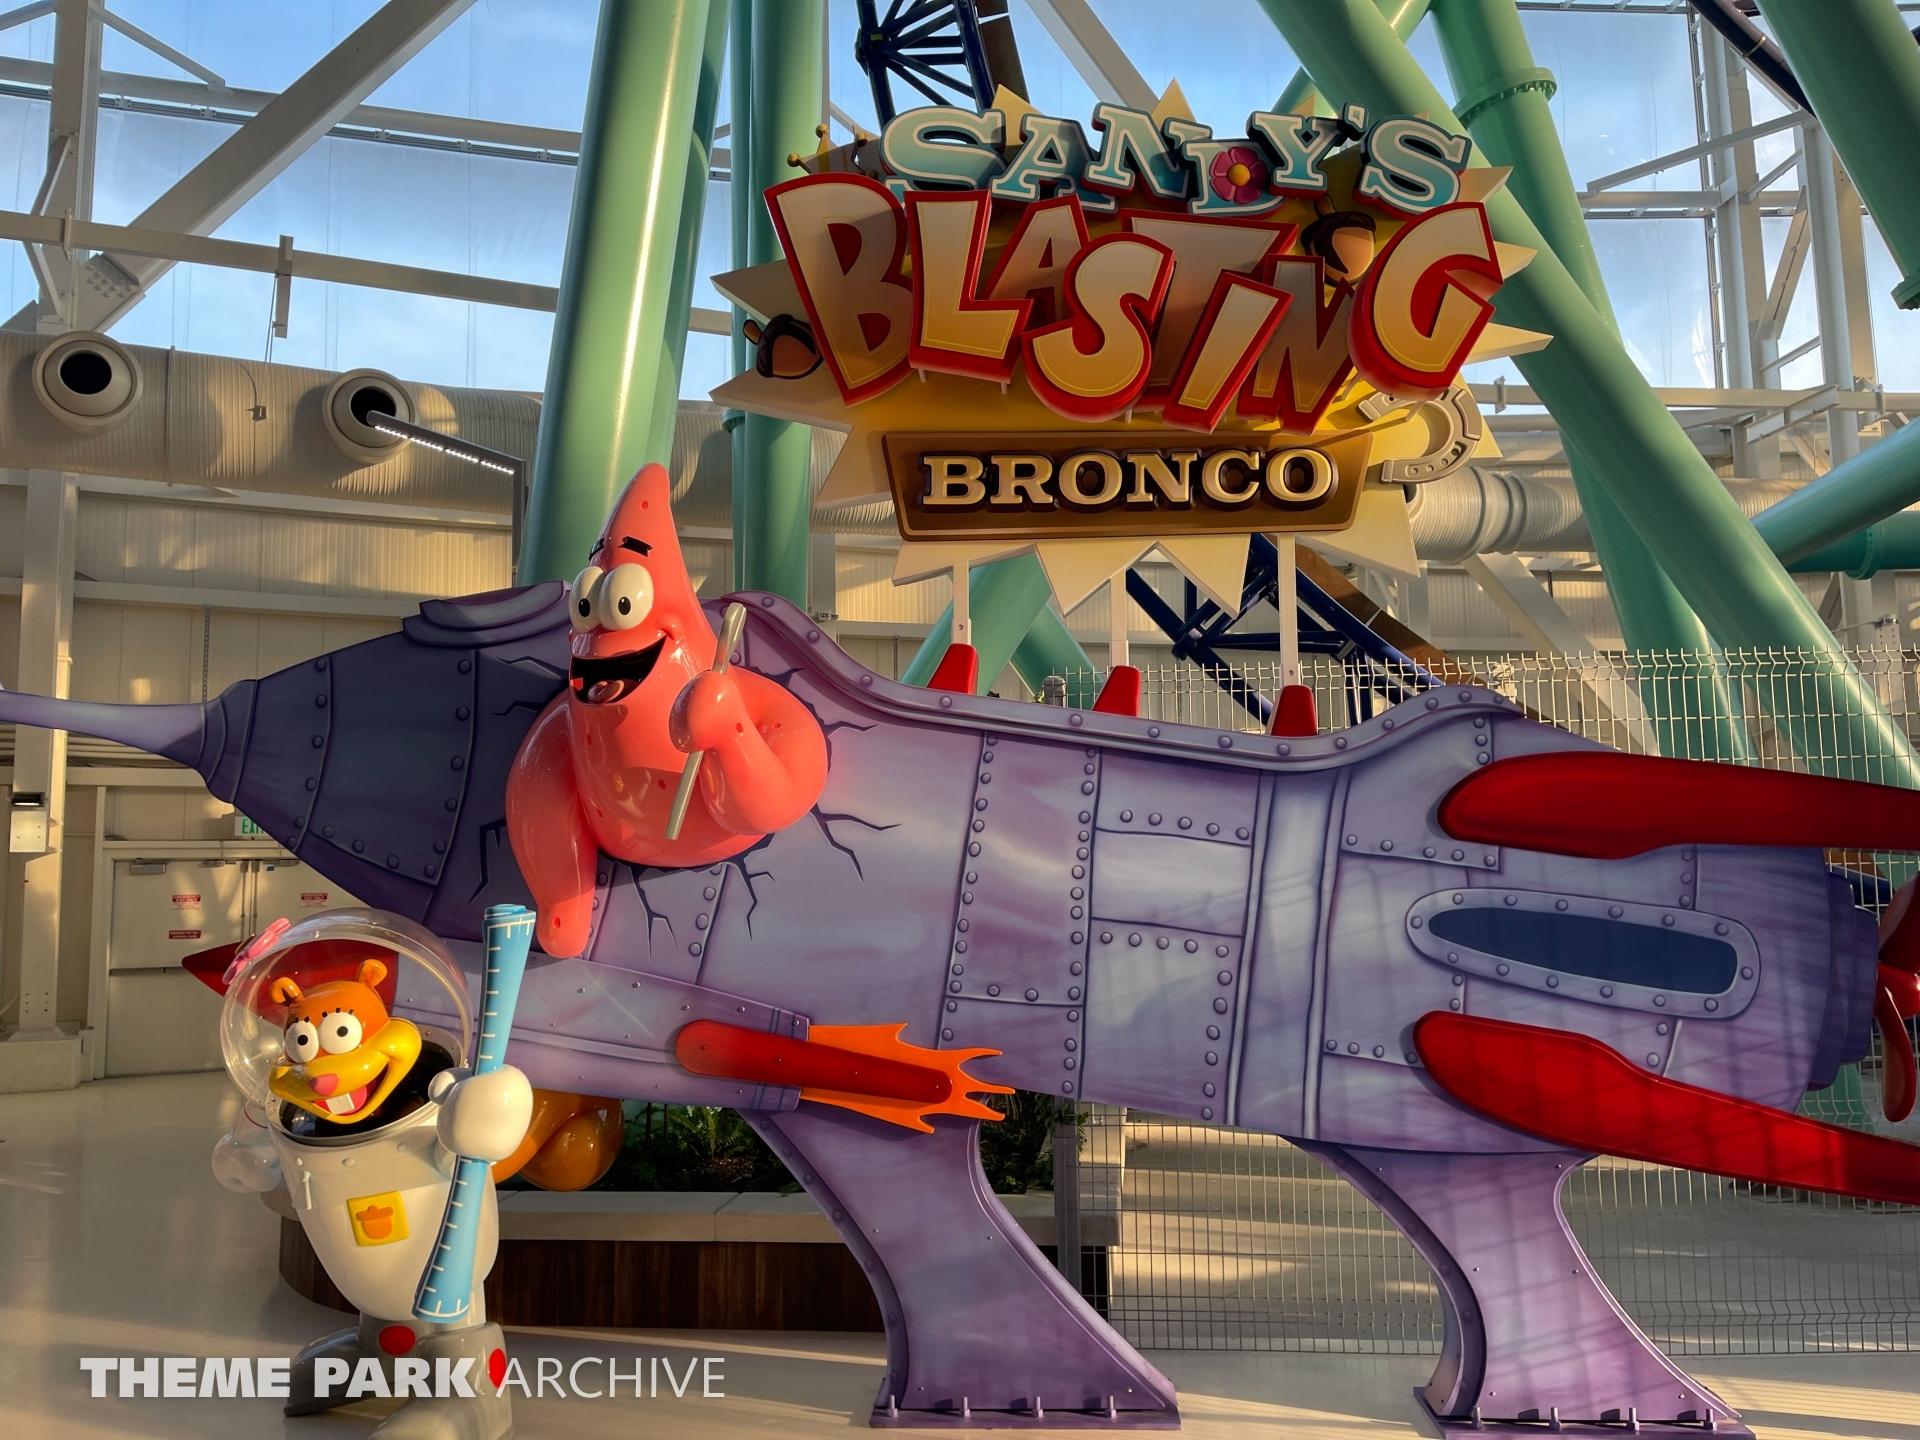 Sandy's Blasting Bronco at Nickelodeon Universe at American Dream